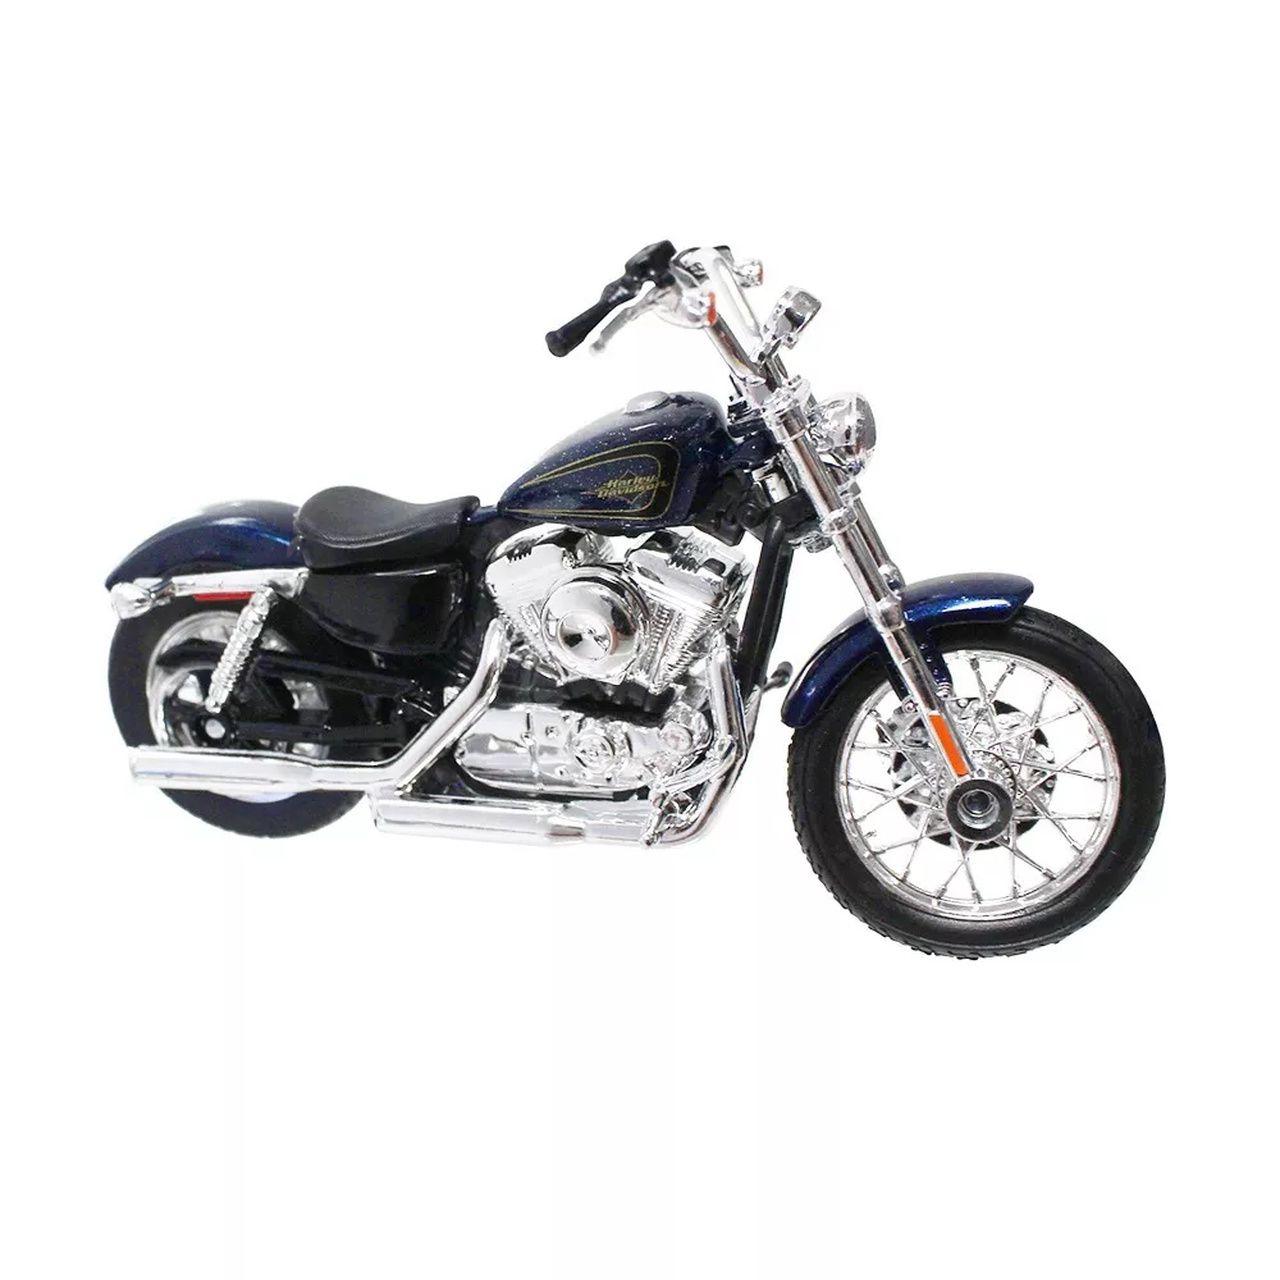 Miniatura Moto 2012 XL 1200V Seventy-Two: Harley Davidson (Serie 34) Escala 1/18 - Maisco